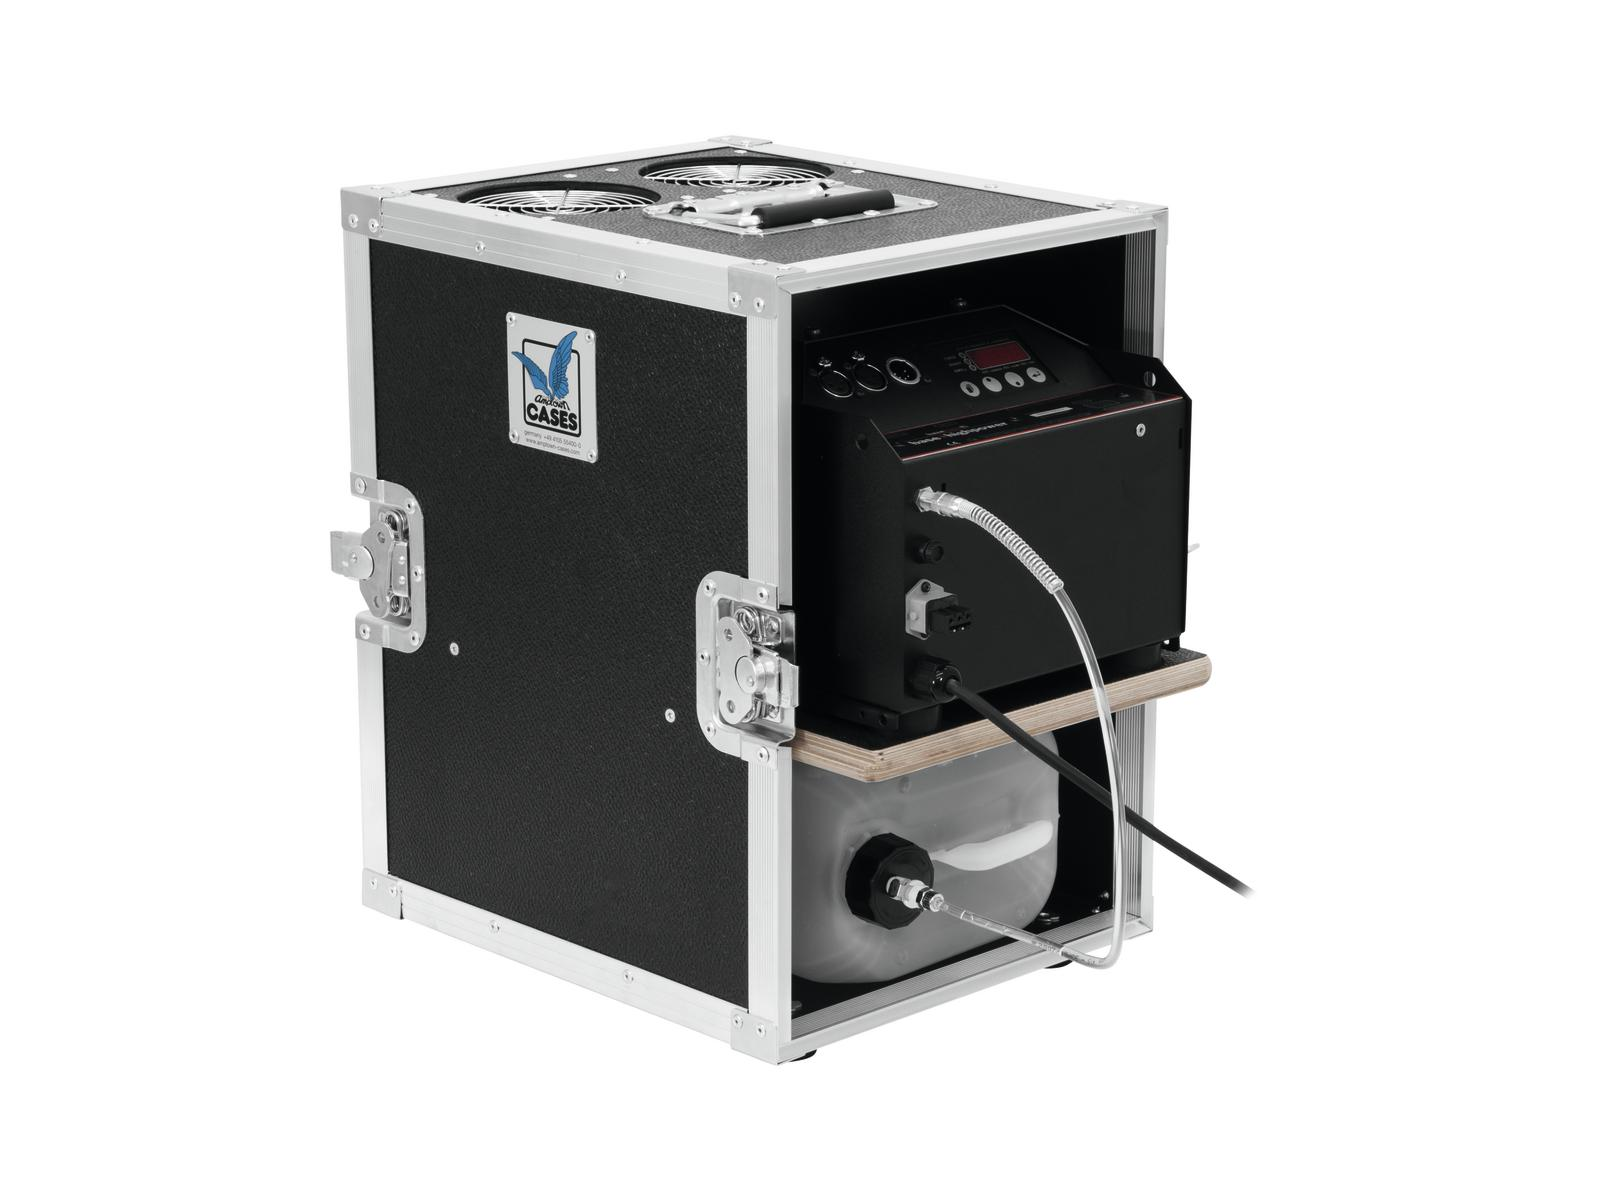 Macchina Del Fumo Nebbia 2600 watt DMX HAZEBASE con Flycase